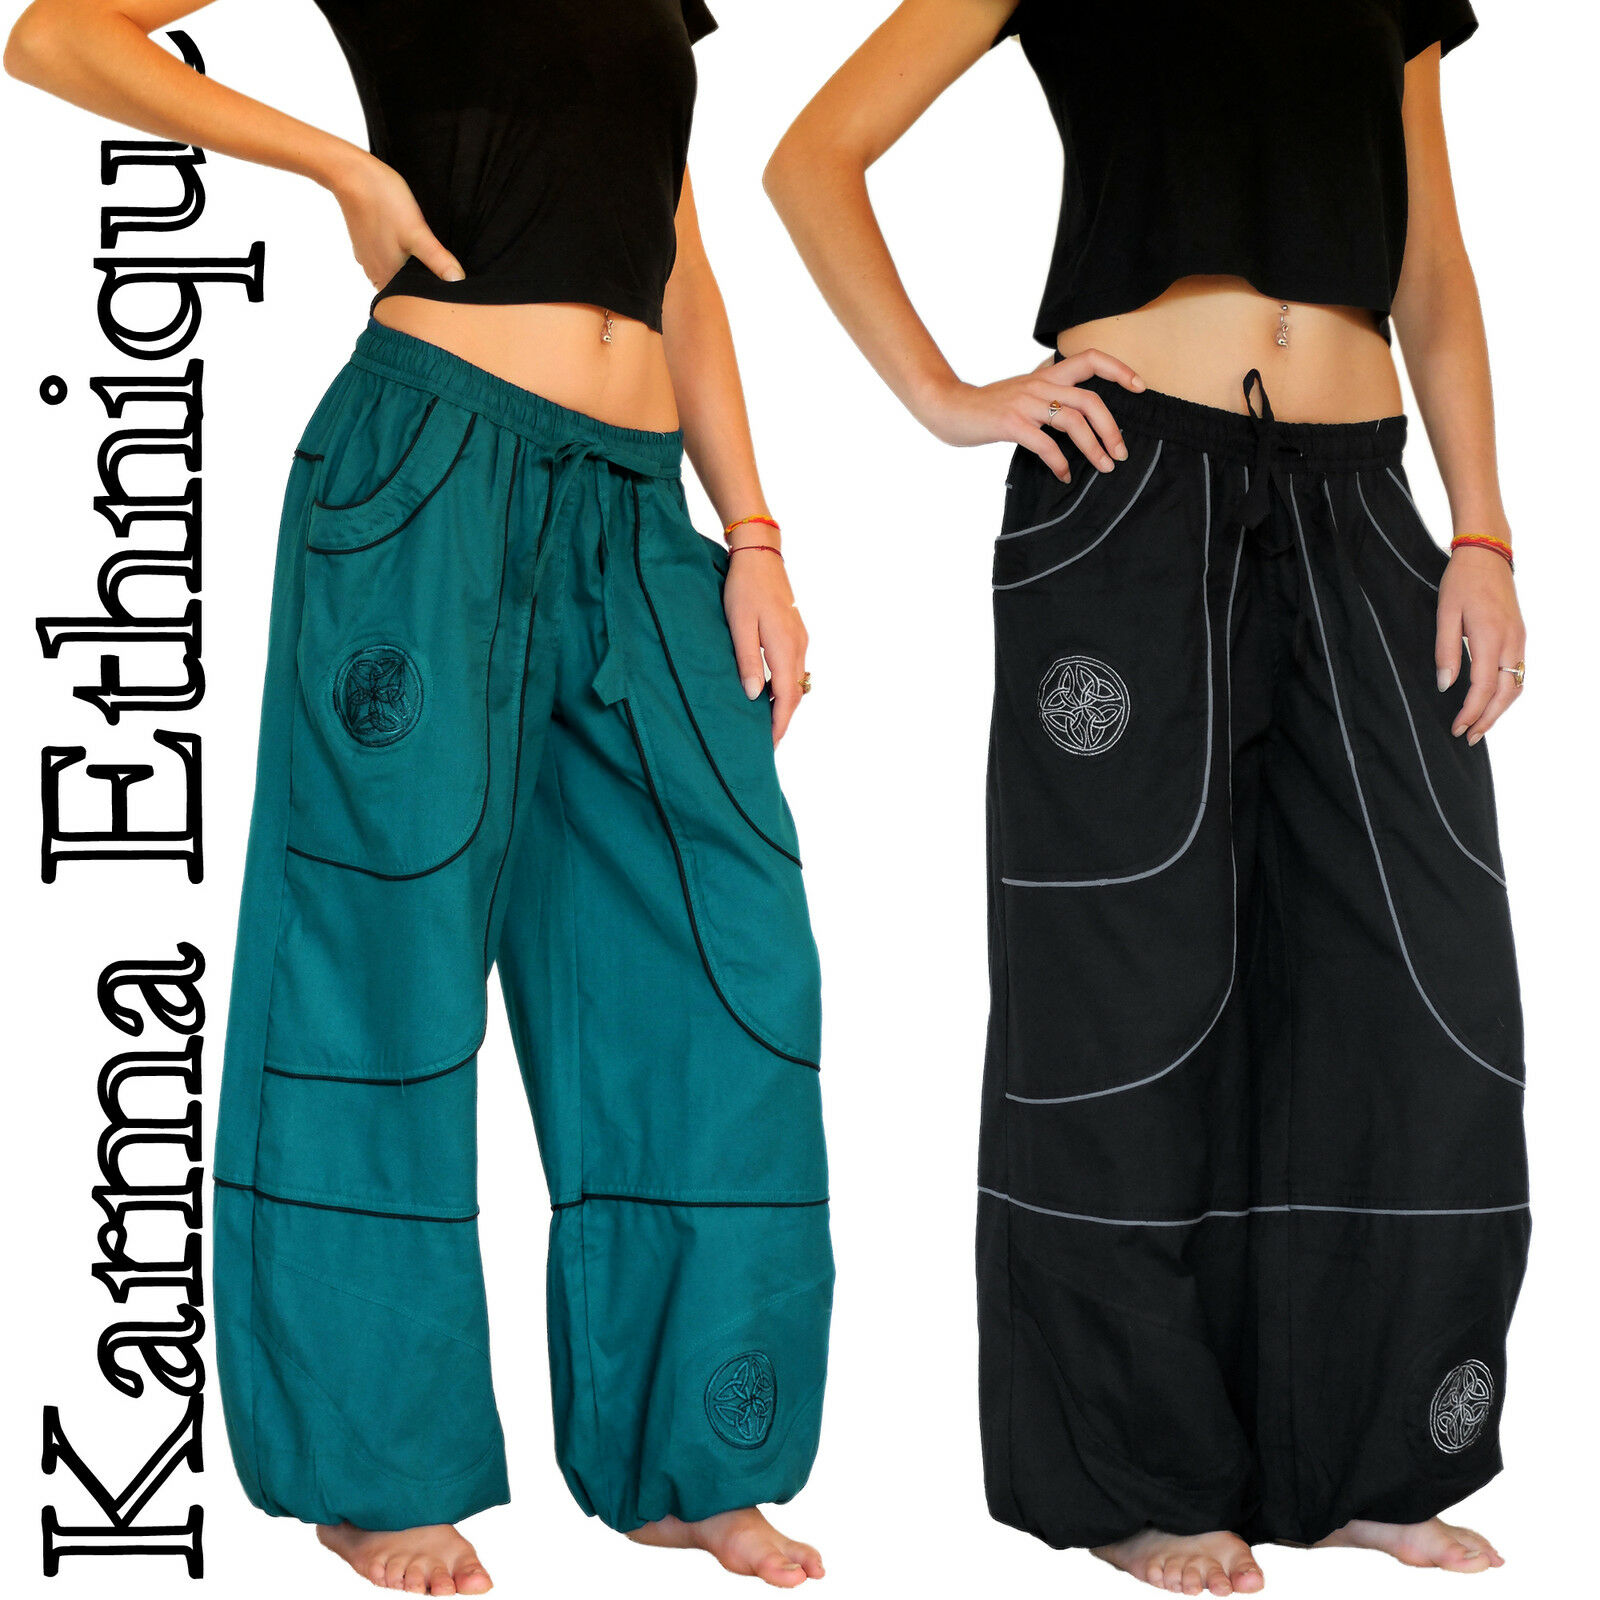 Pantalon MIXTE (36 38 40 42 44 46 48 50 52) sarouel coton grande size PA15